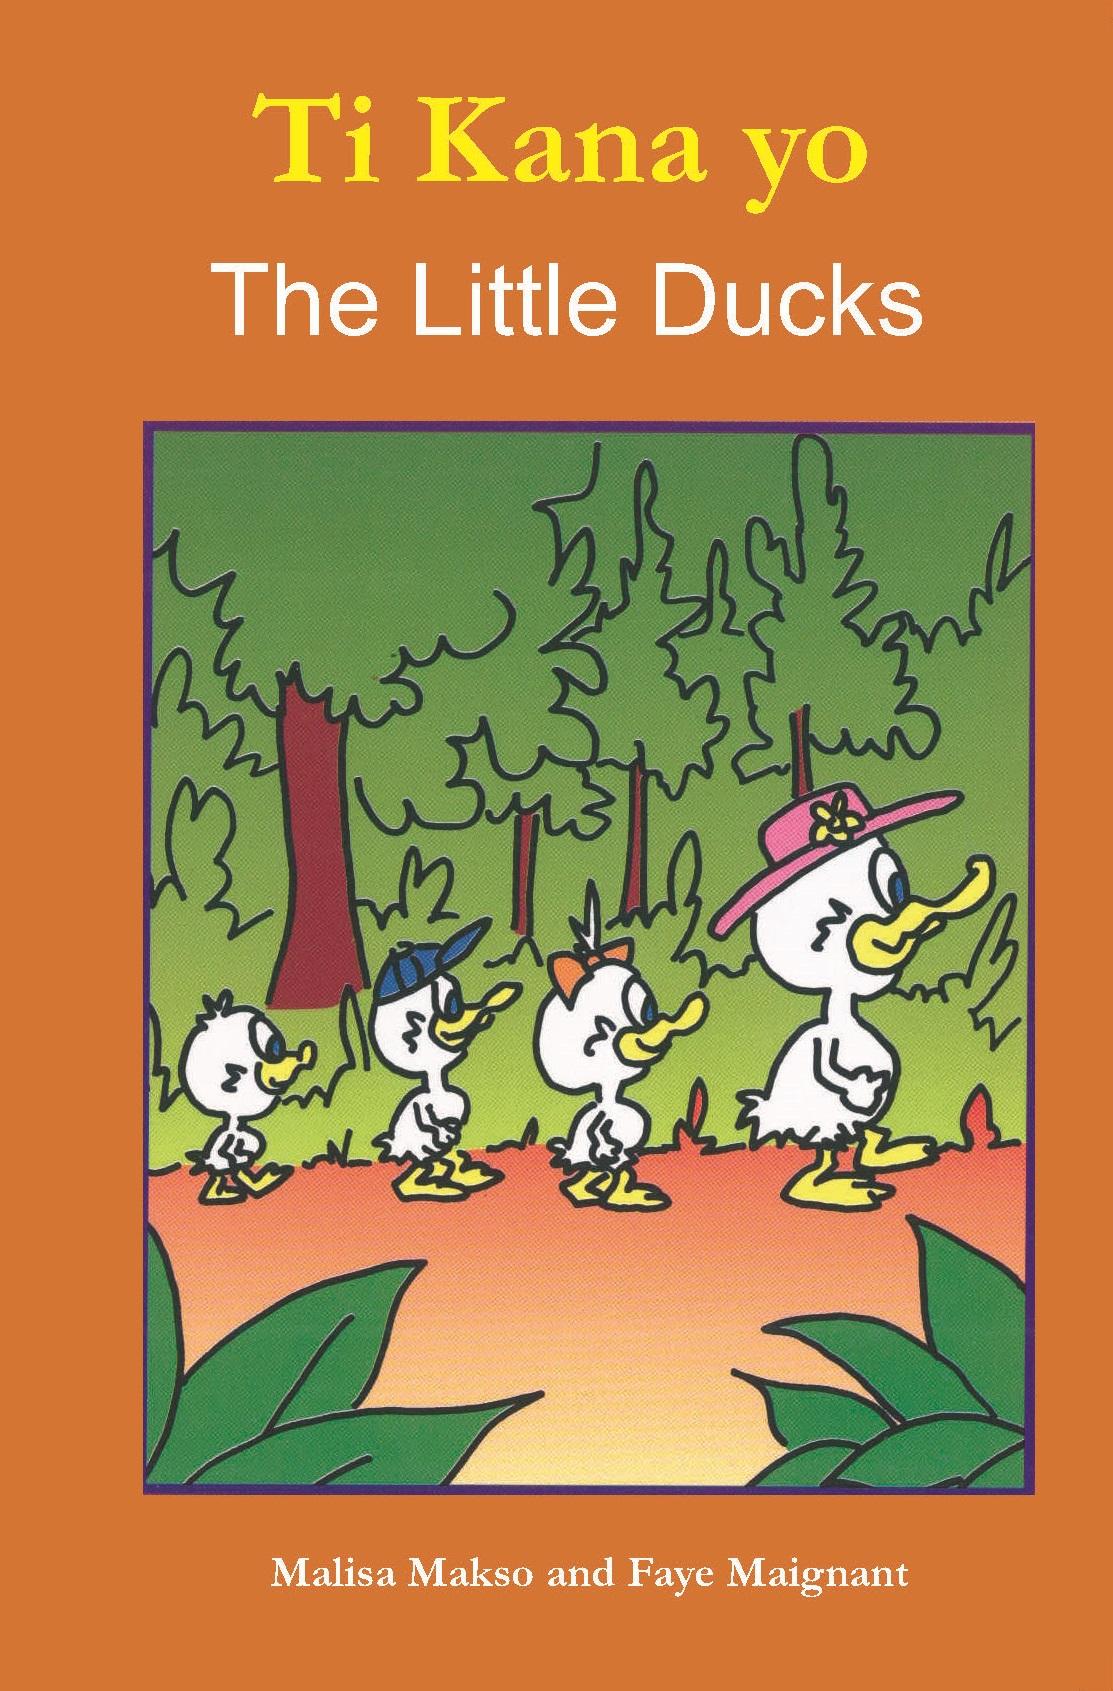 Ti kana yo / Little Ducks